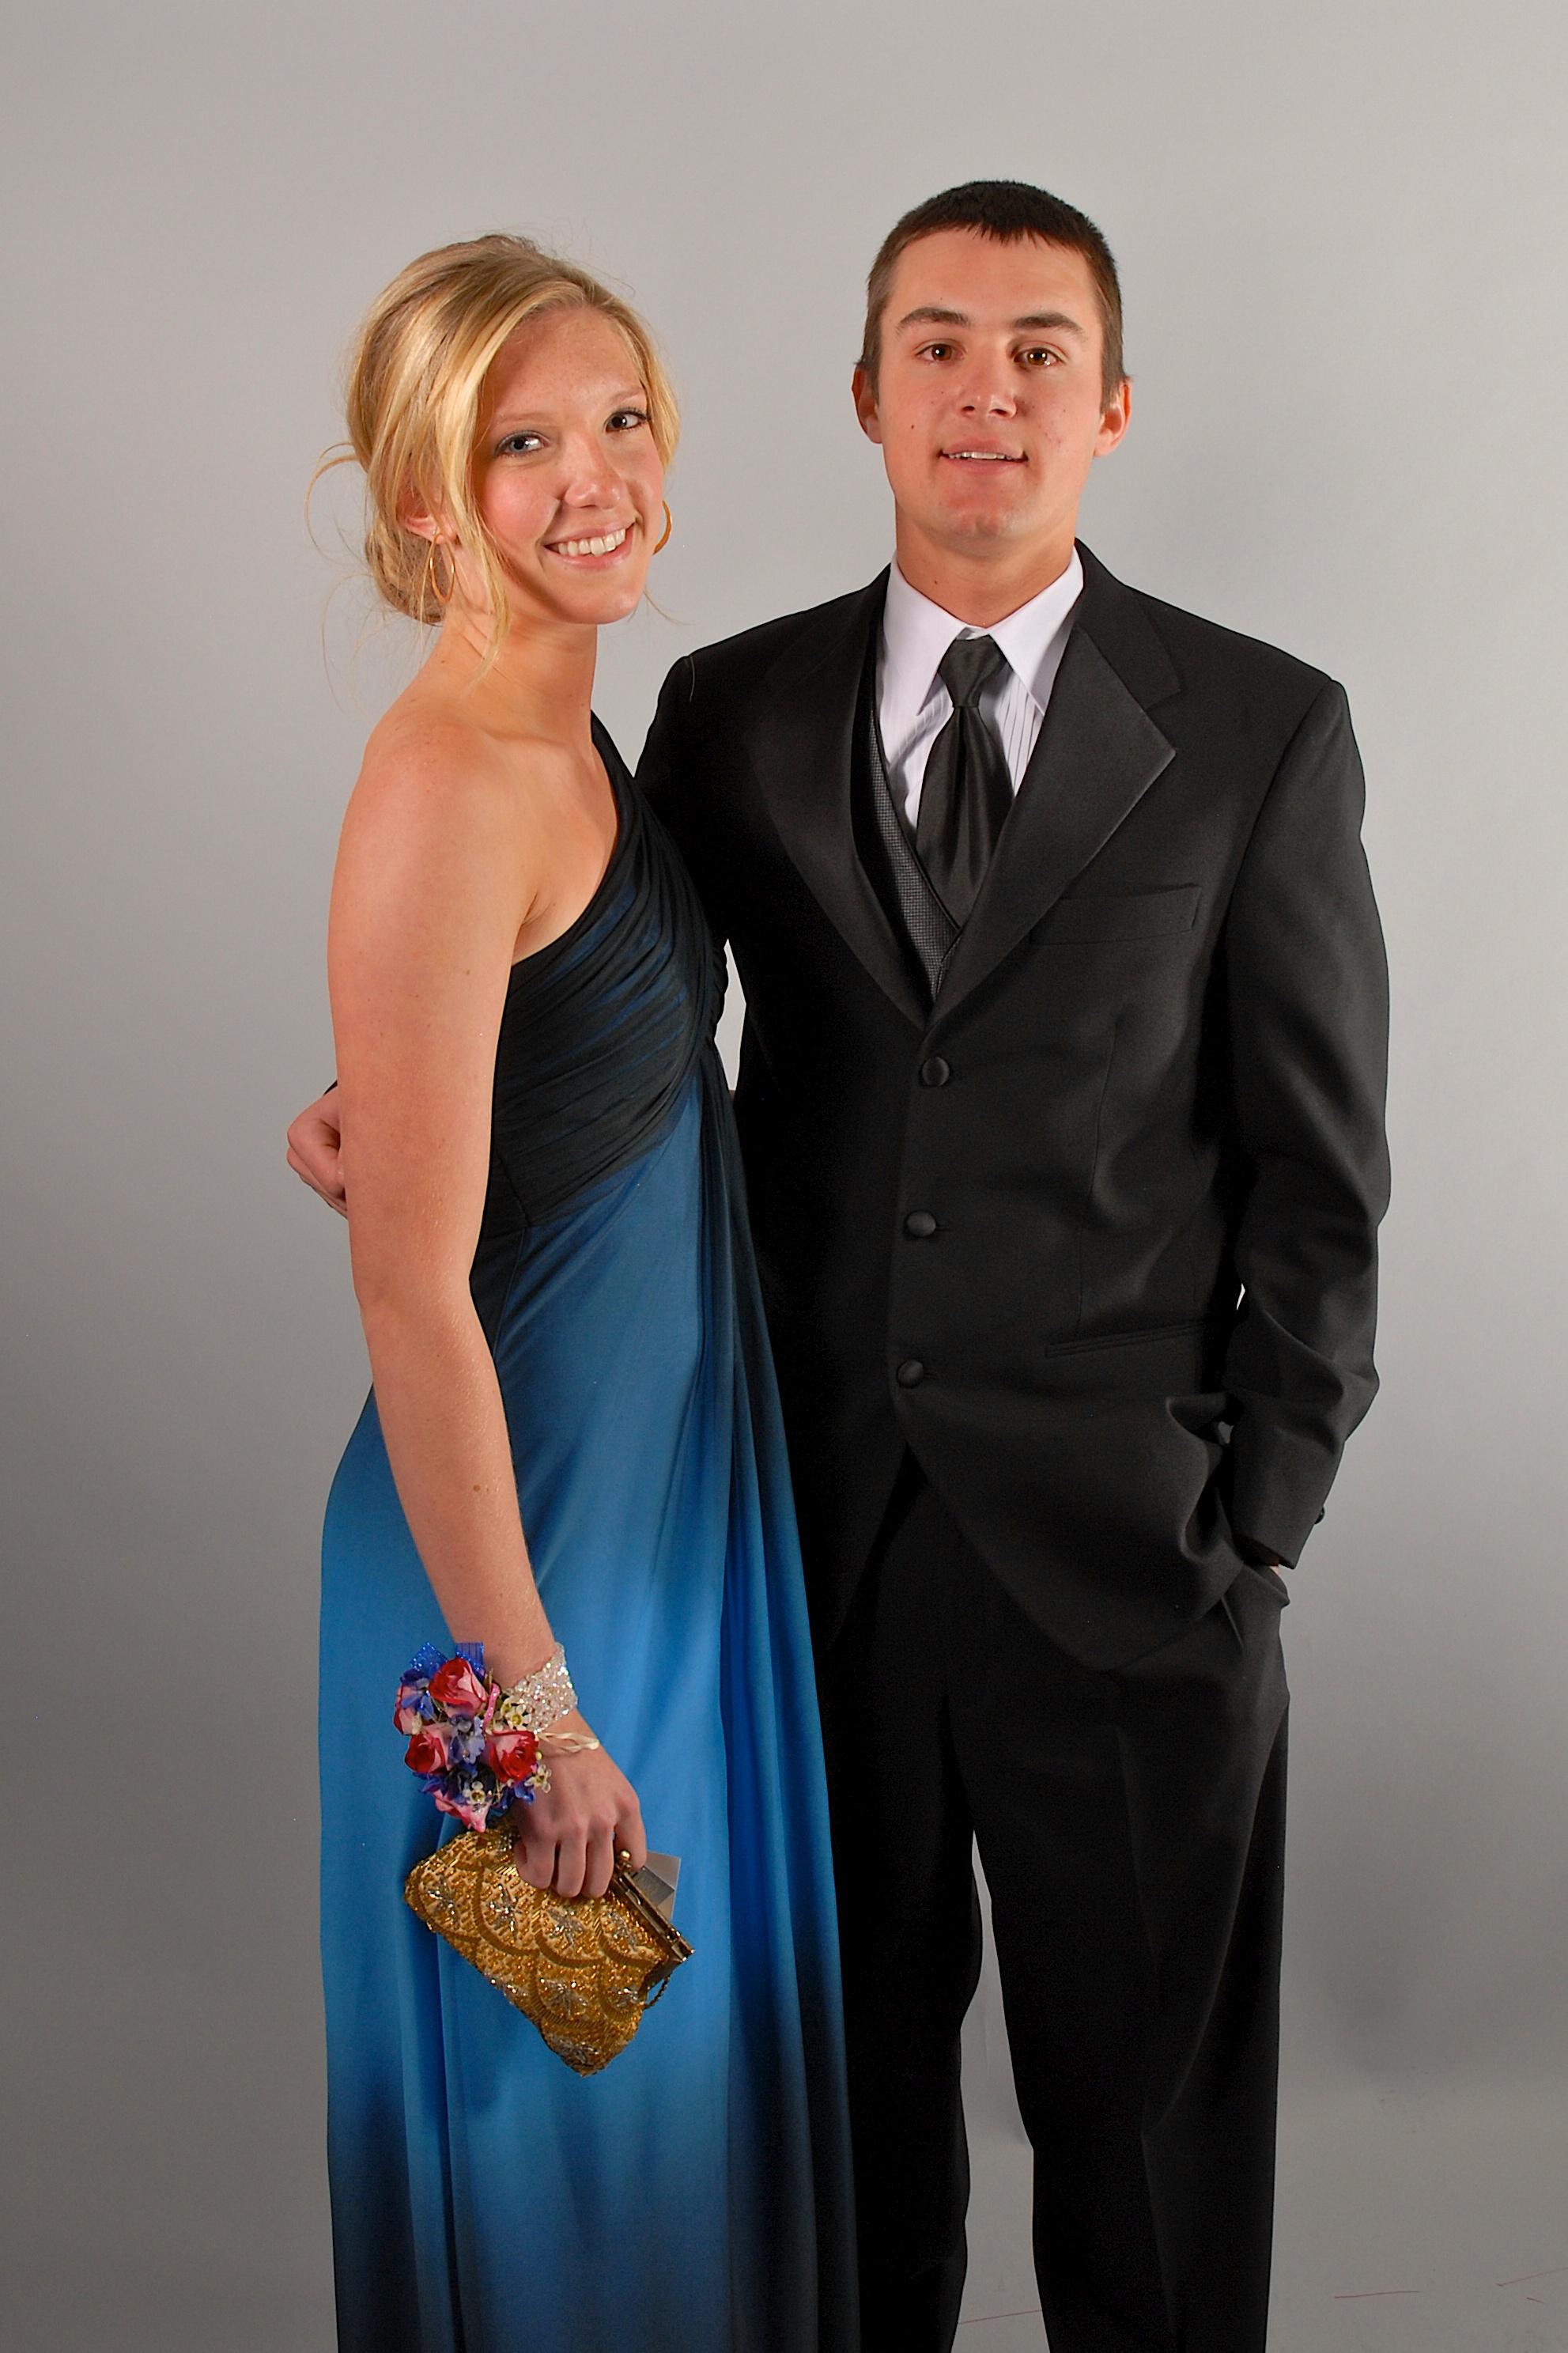 Professional Prom Photos   www.pixshark.com - Images ...